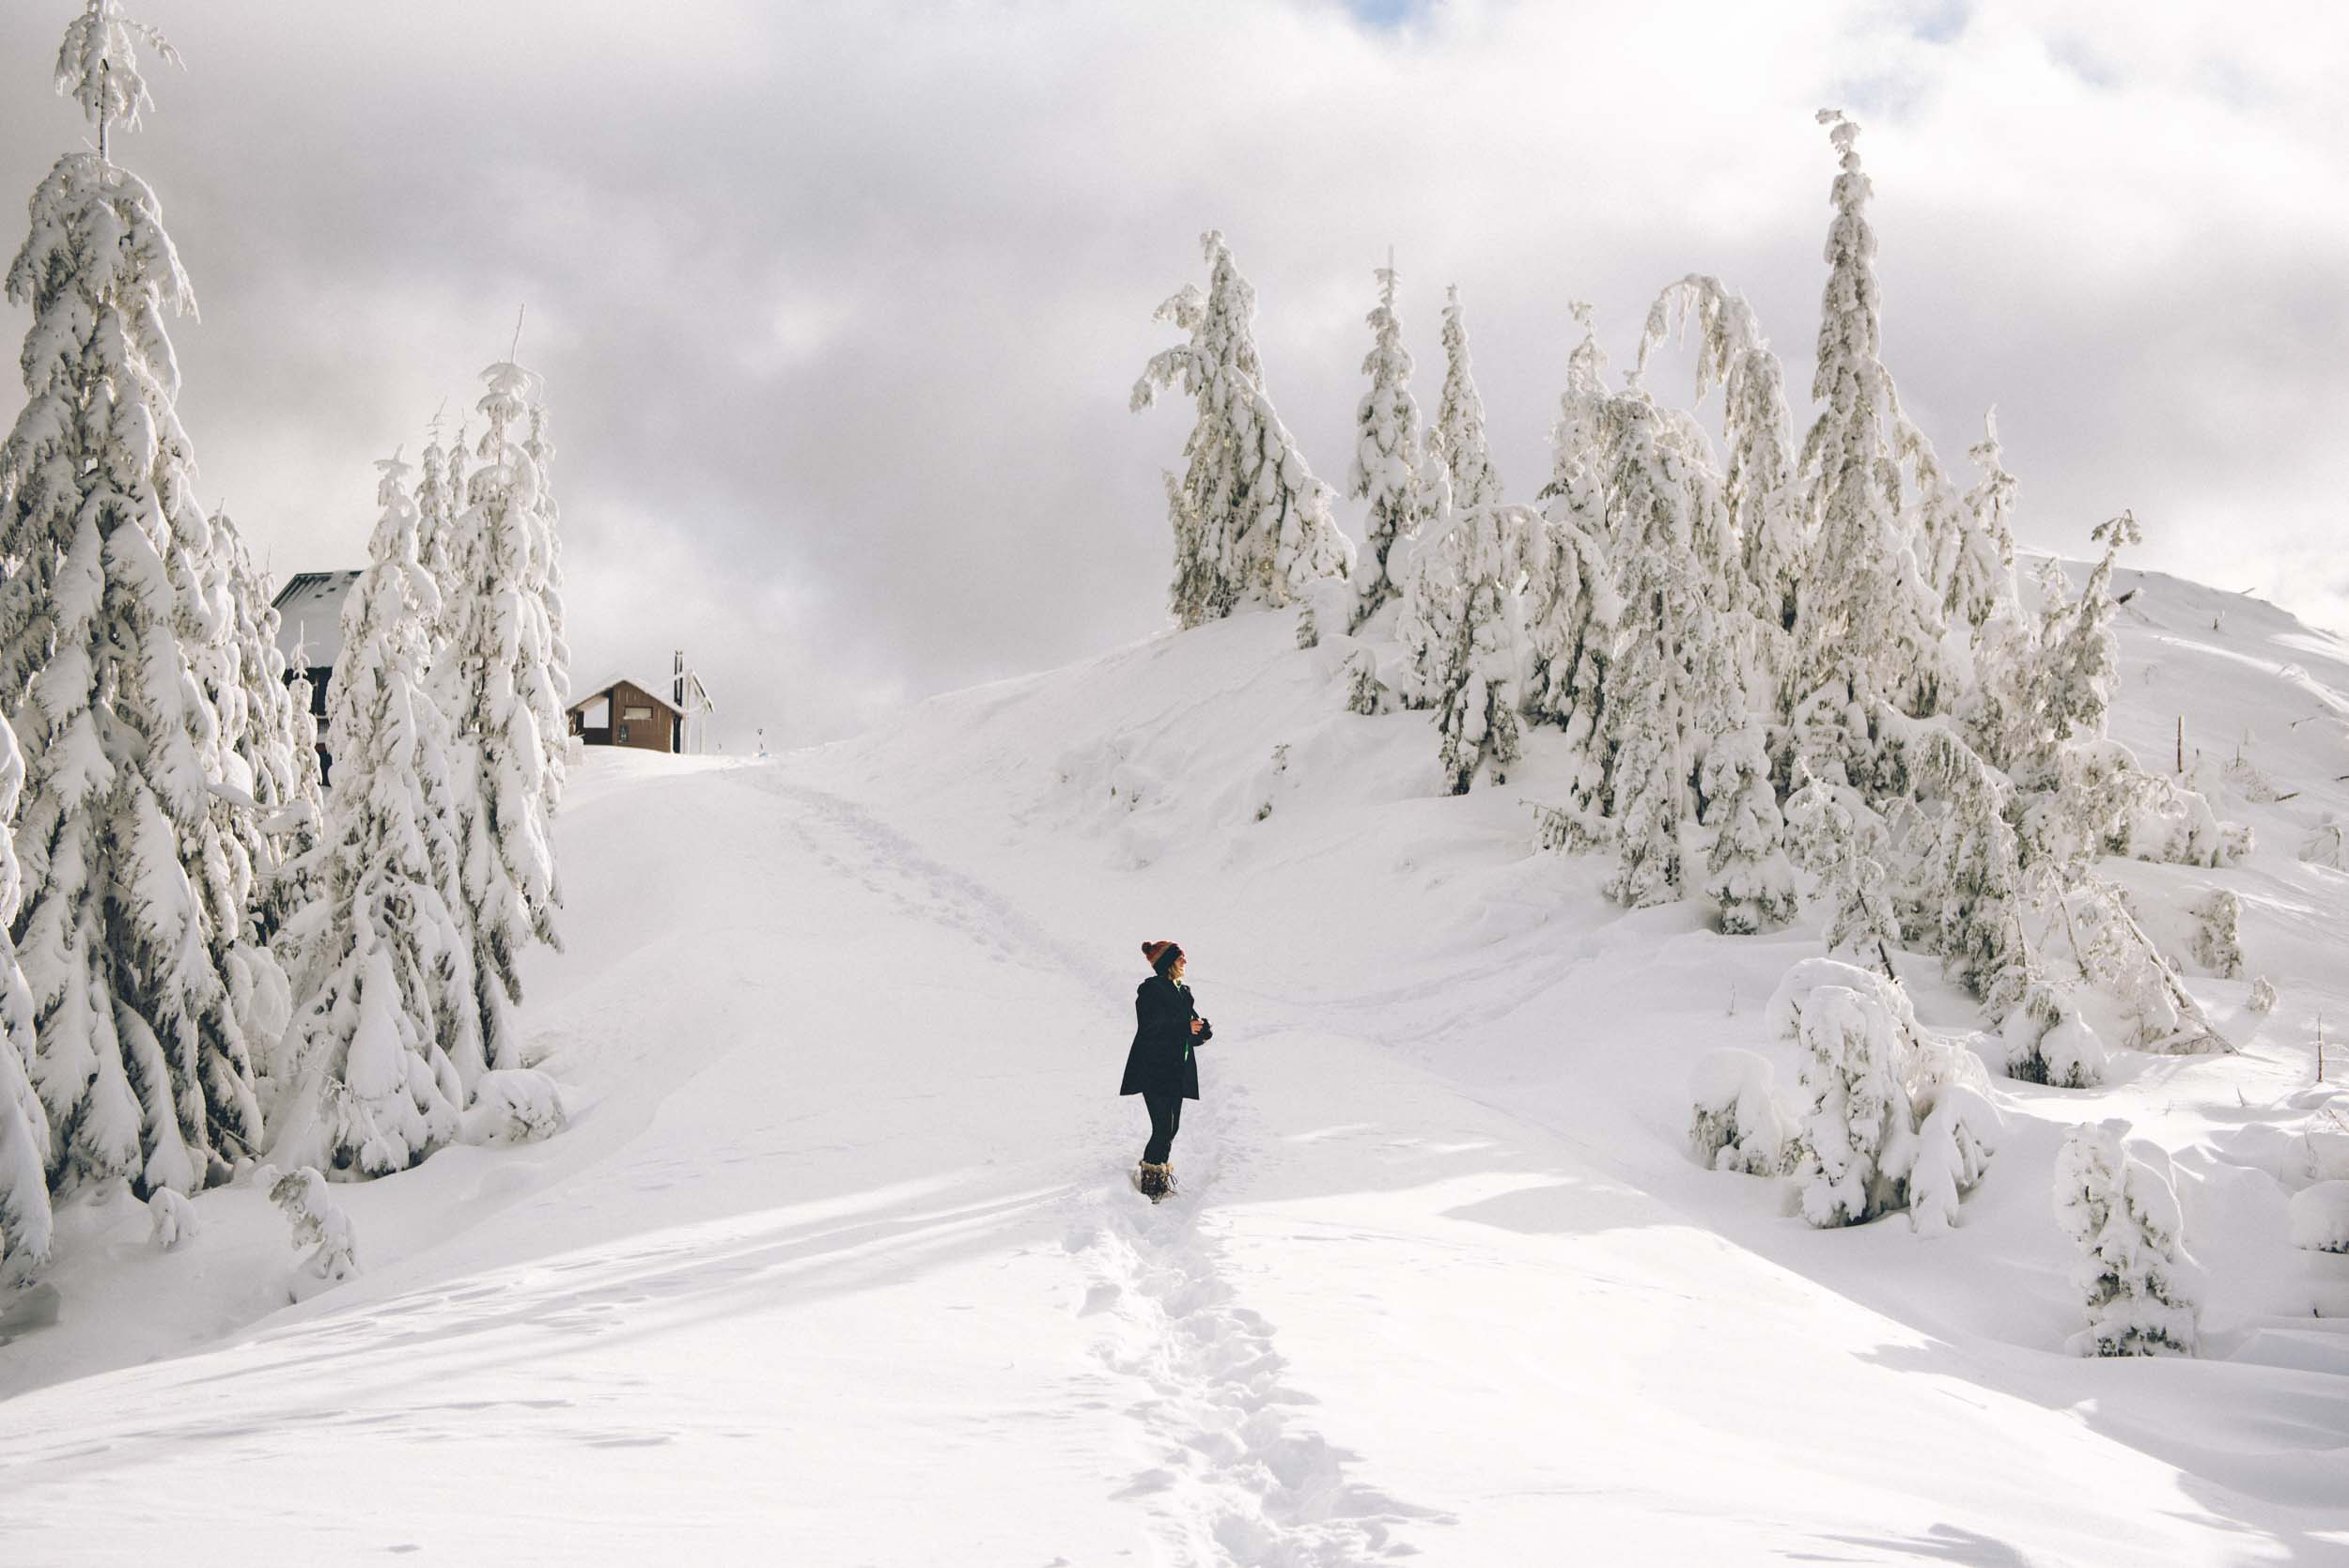 Miriam-Subbiah-Snow-Bowl-Hut-23.jpg